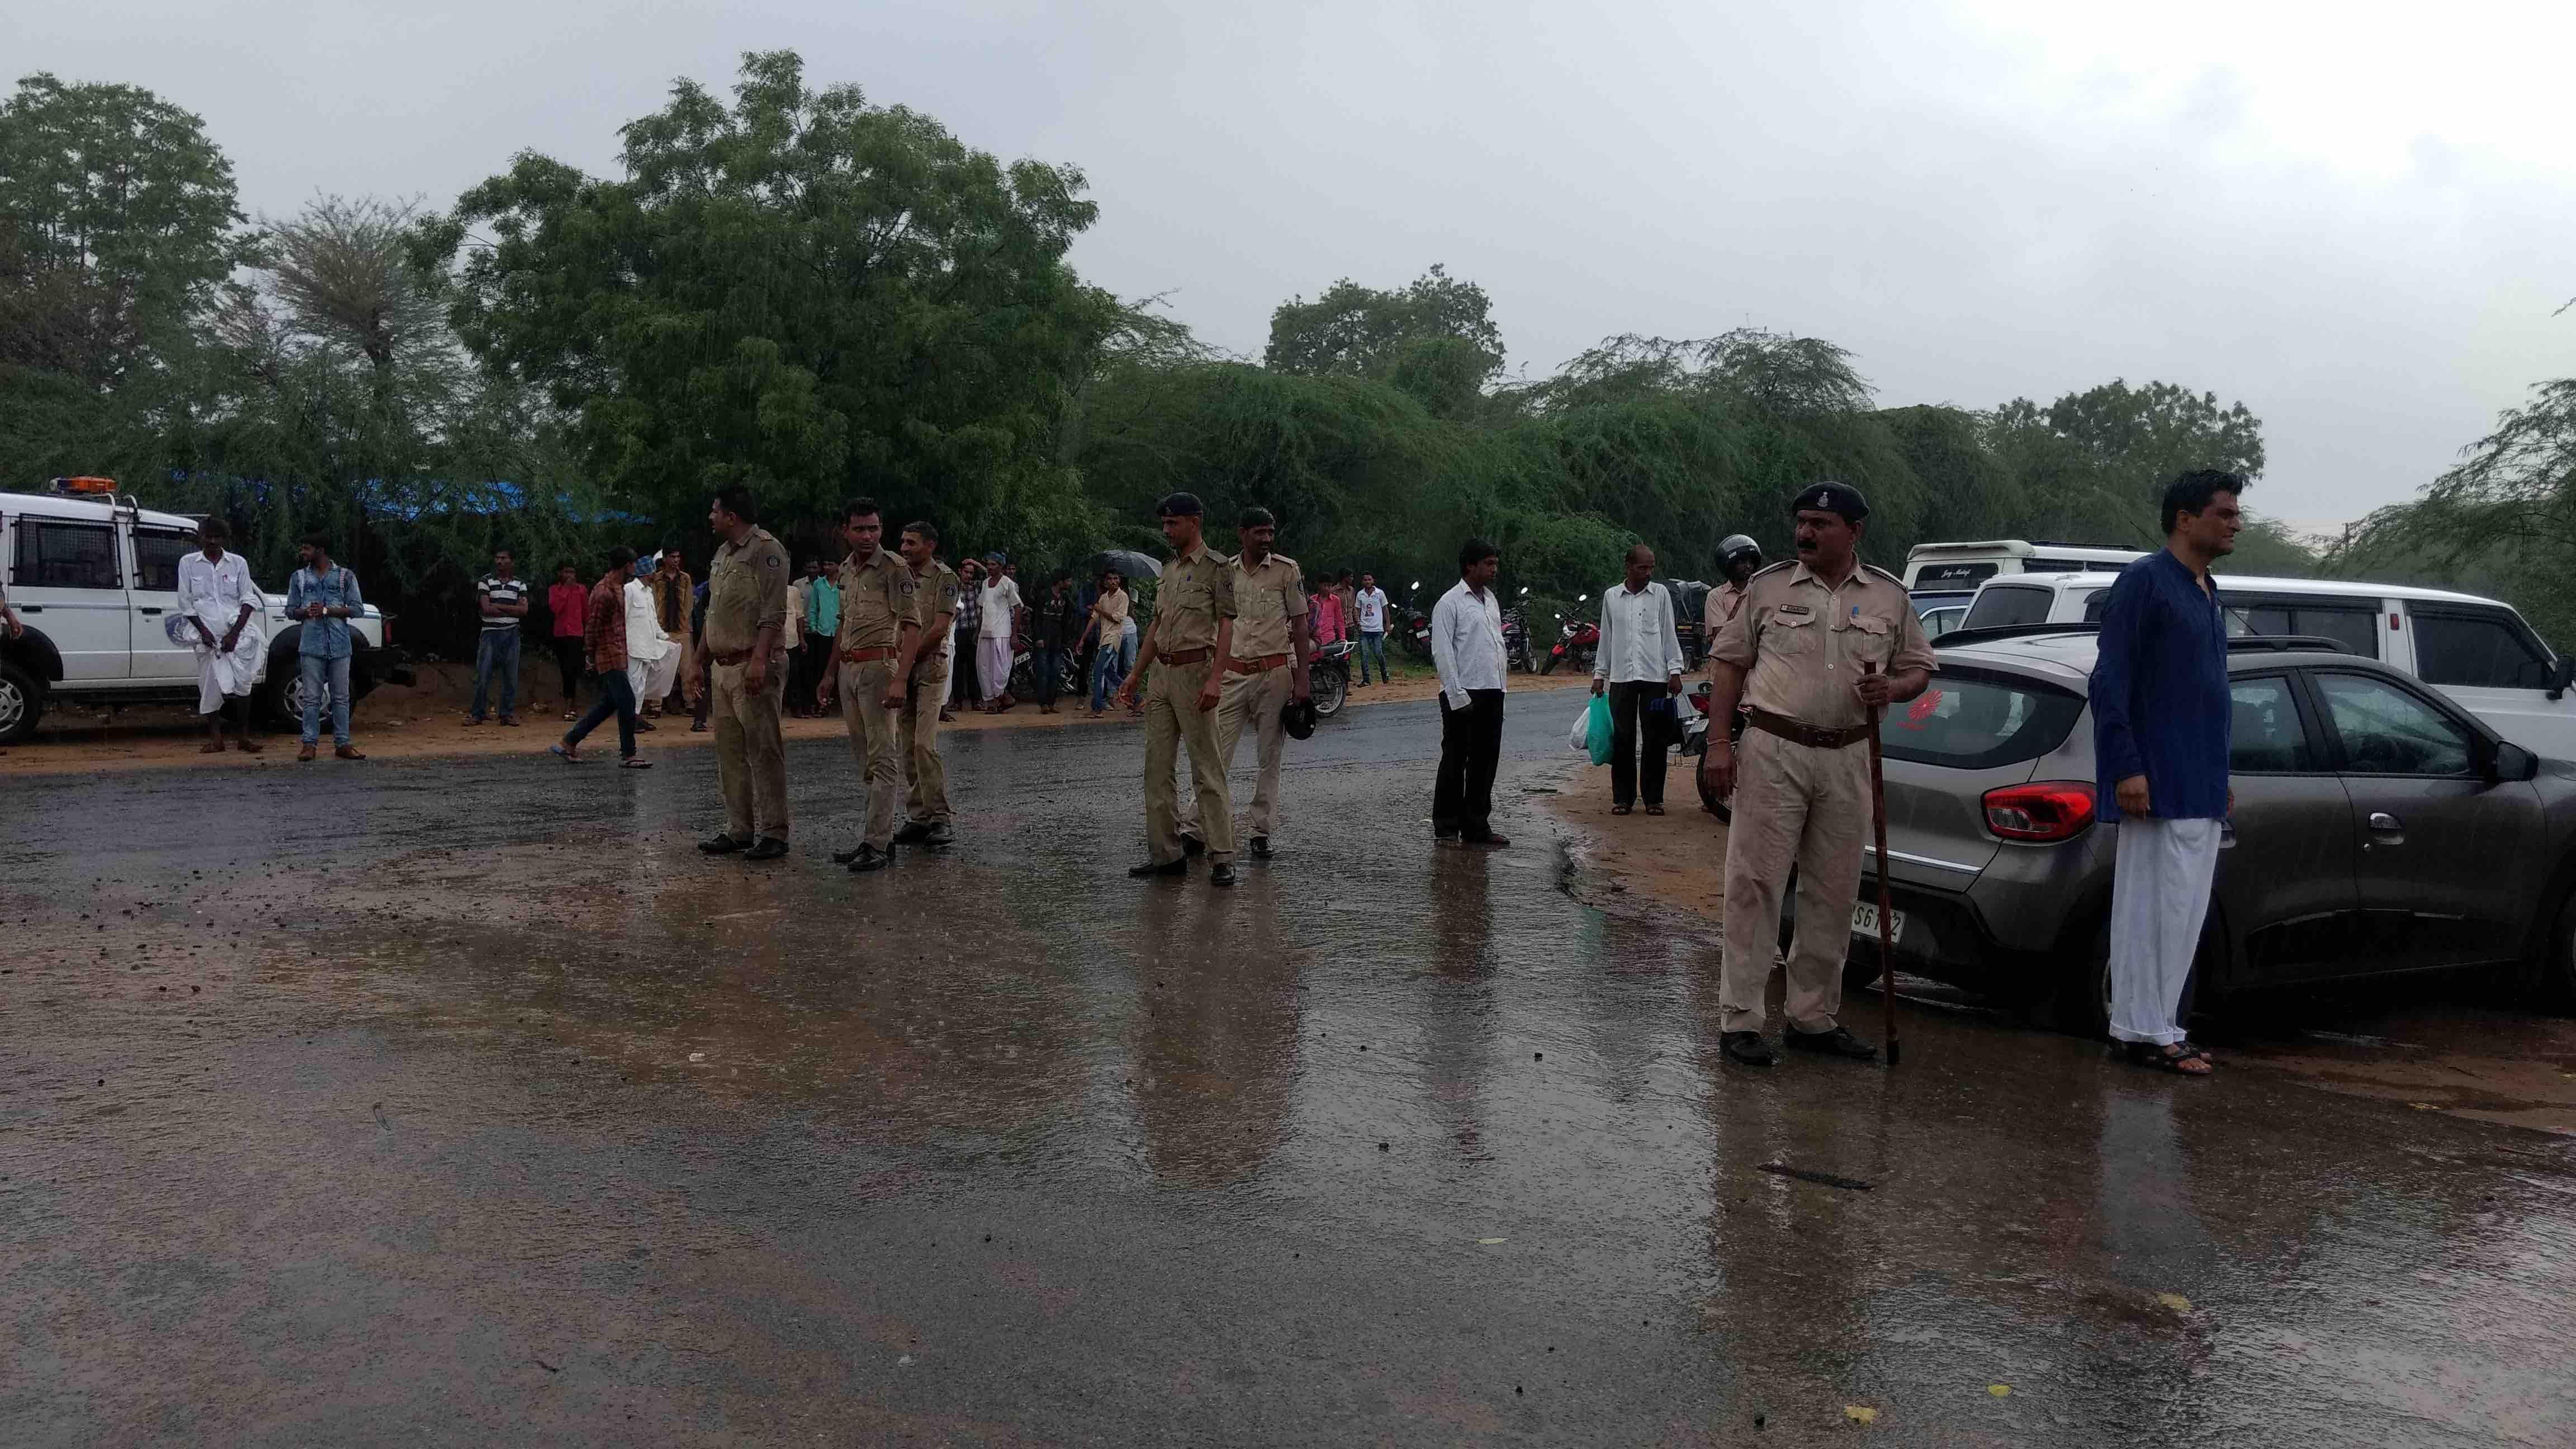 Heavy police deployment at Lavara village. Credit: Damayantee Dhar